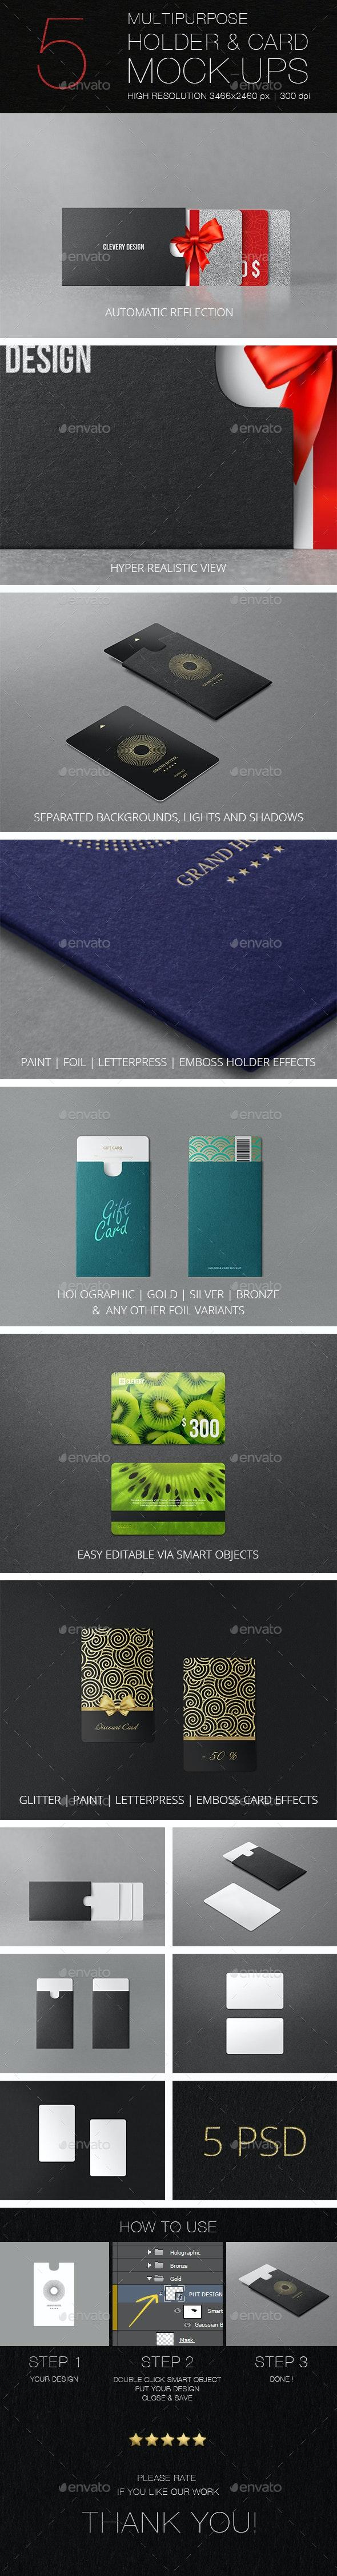 Multipurpose Holder & Card Mockup Vol 1.0 - Miscellaneous Print